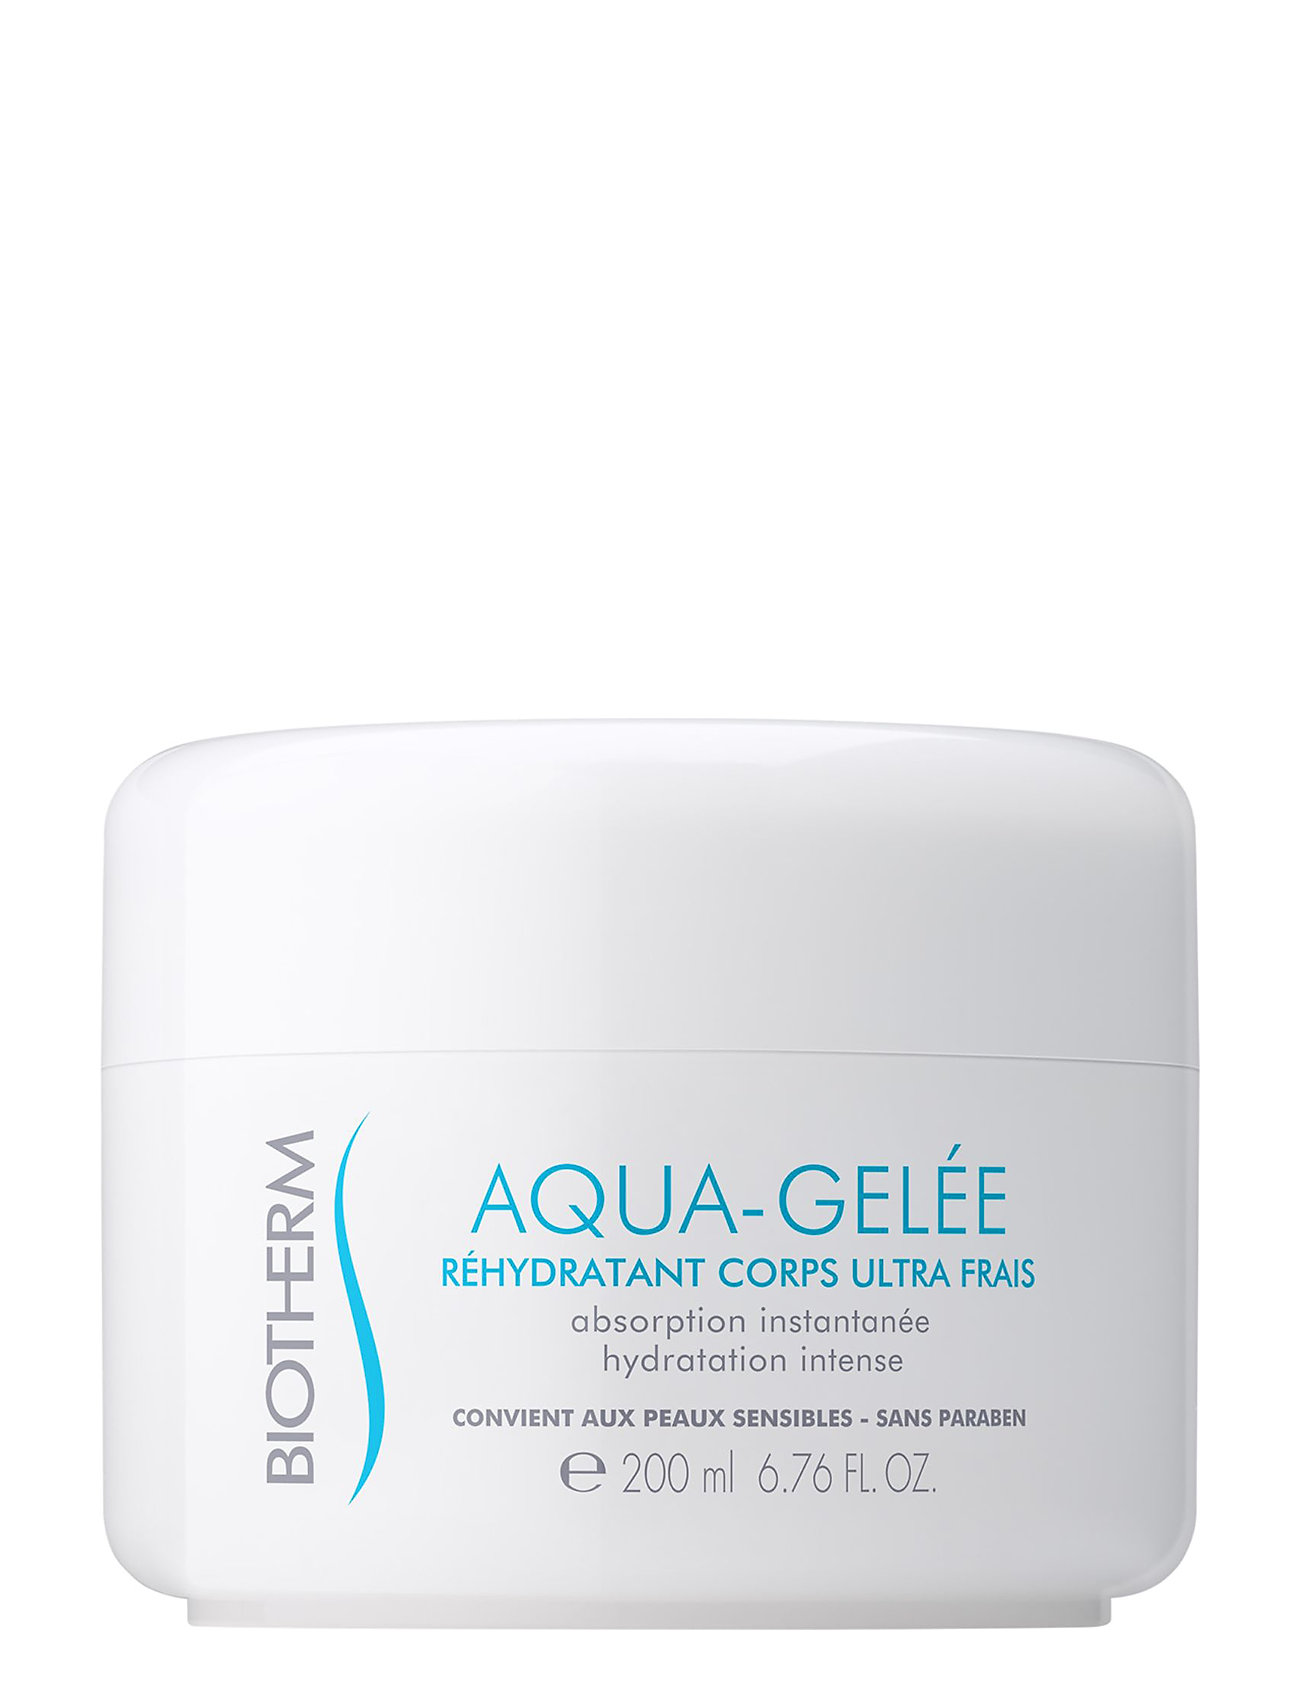 Aqua gelã©e body gel 200 ml fra biotherm på boozt.com dk